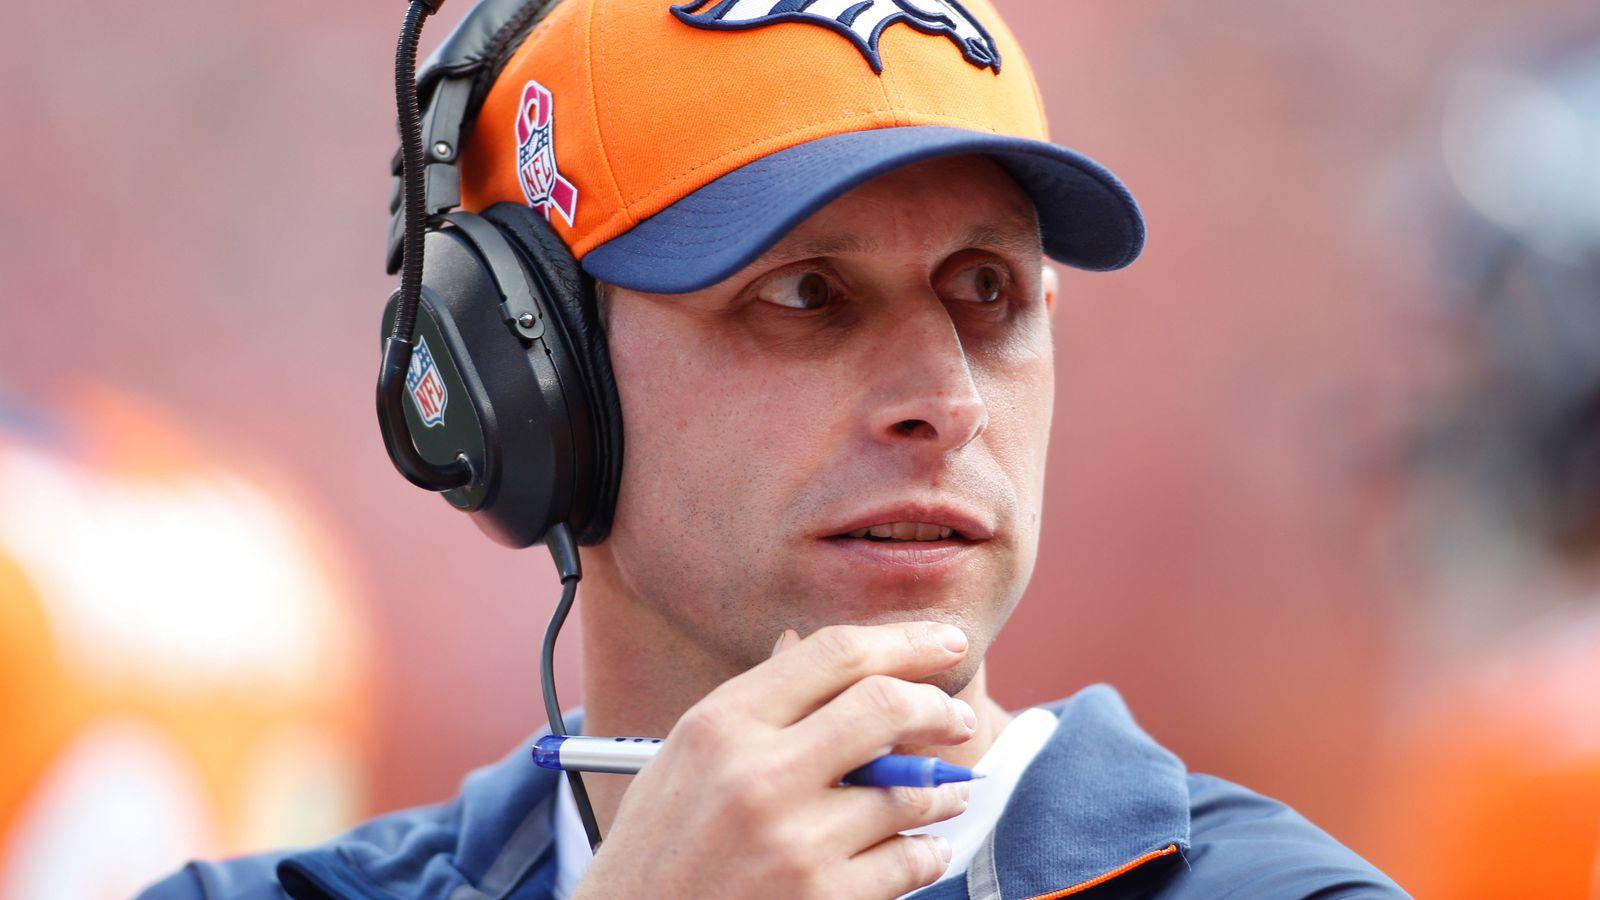 Miami Dolphins head coach Adam Gase speaks to the media about quarterback Ryan Tannehill